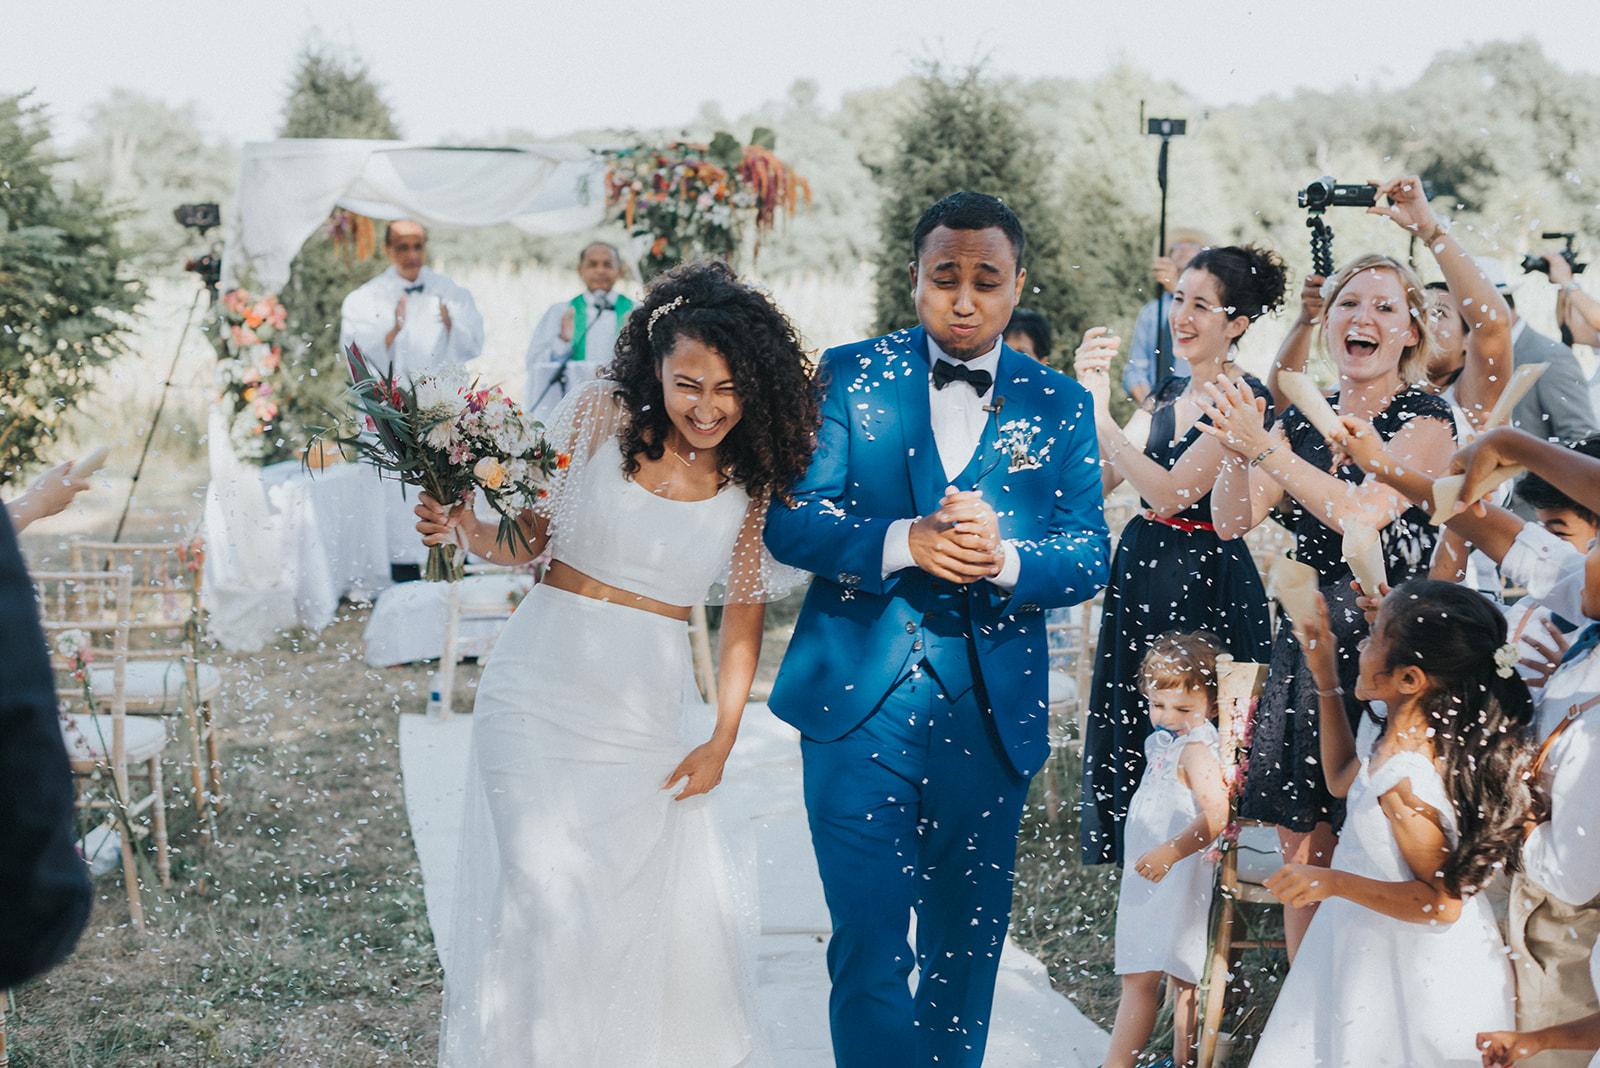 Mariage de Teddy et Arielle-392.jpg